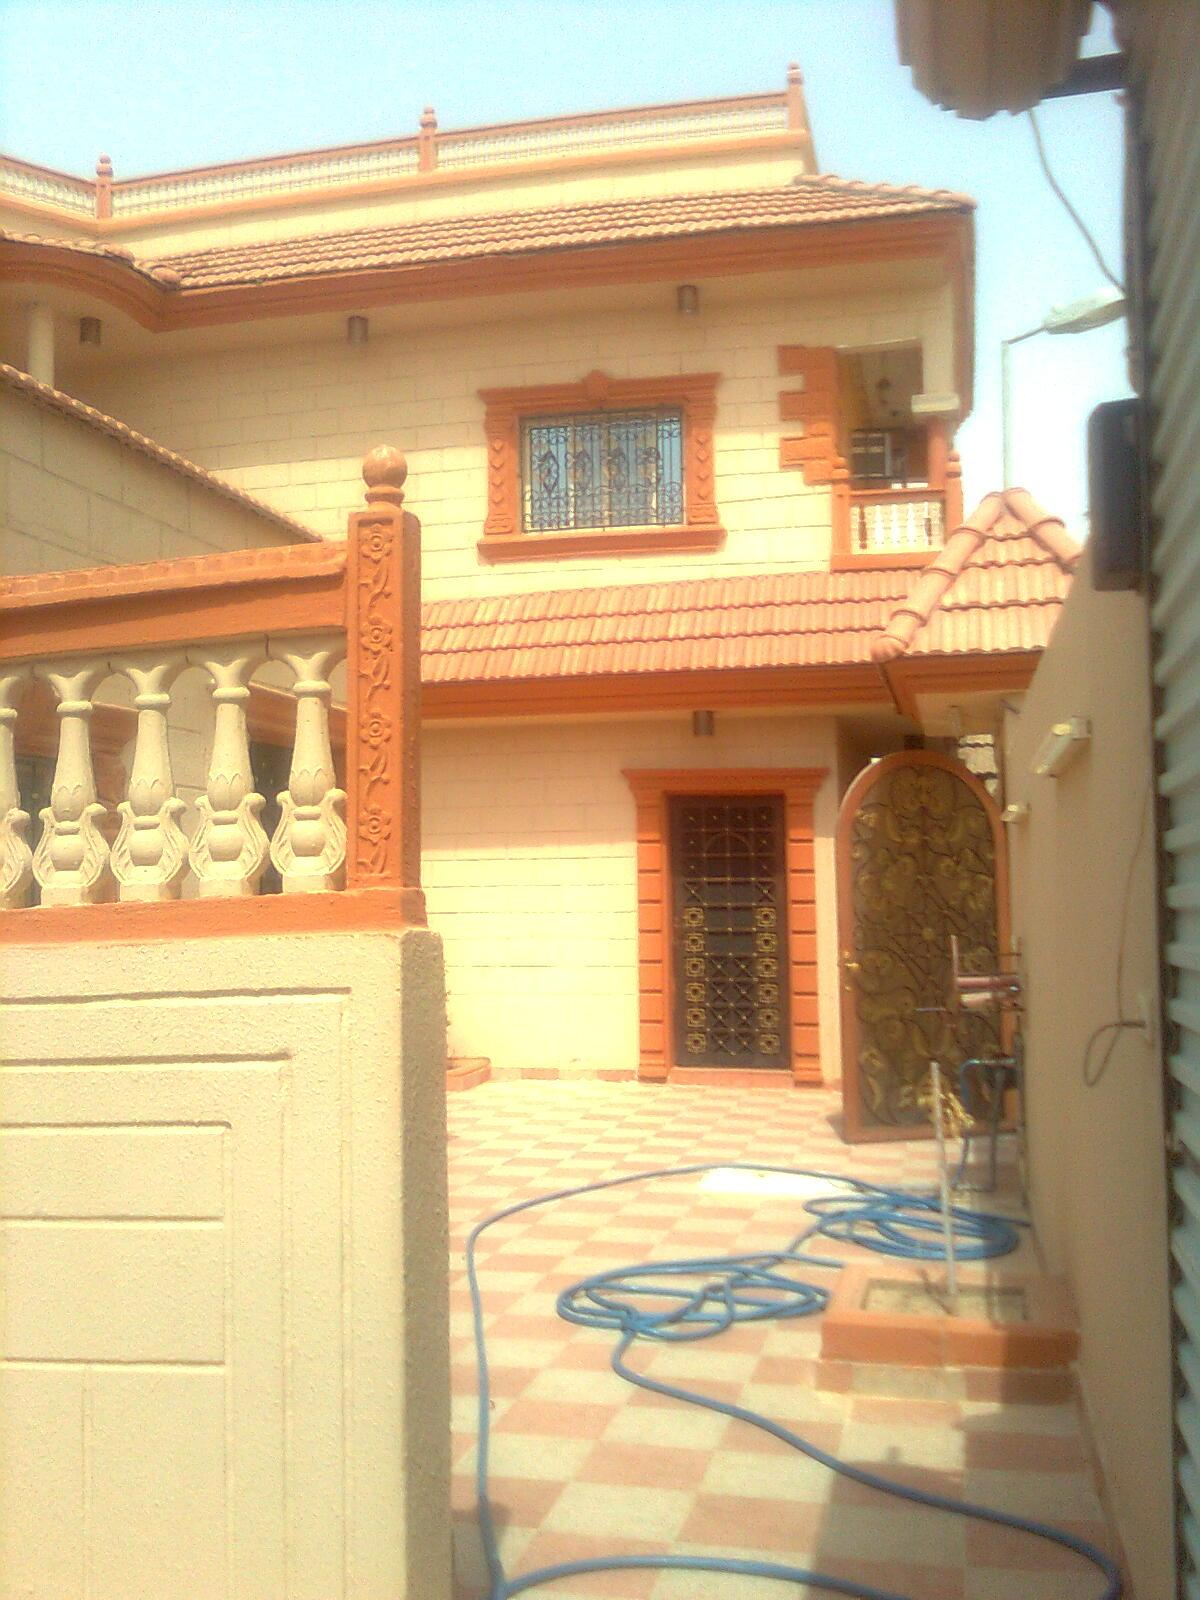 بالصور بيوت للبيع في حفر الباطن f4be648f654ac7a2a91c6d869909a920